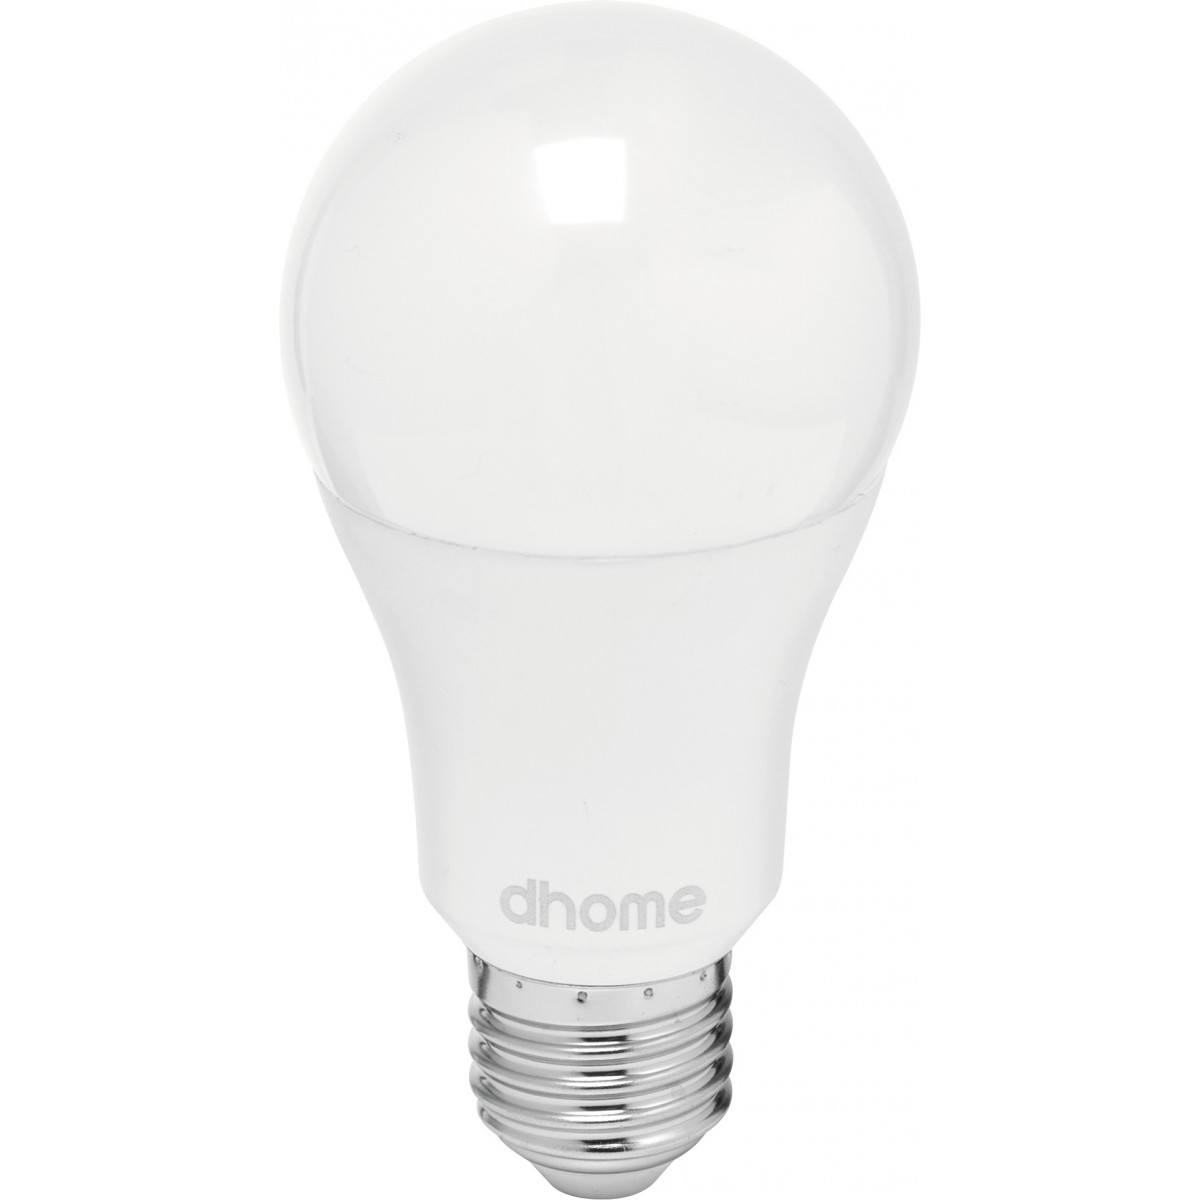 Ampoule LED standard E27 dhome - 1521 Lumens - 14 W - 2700 K